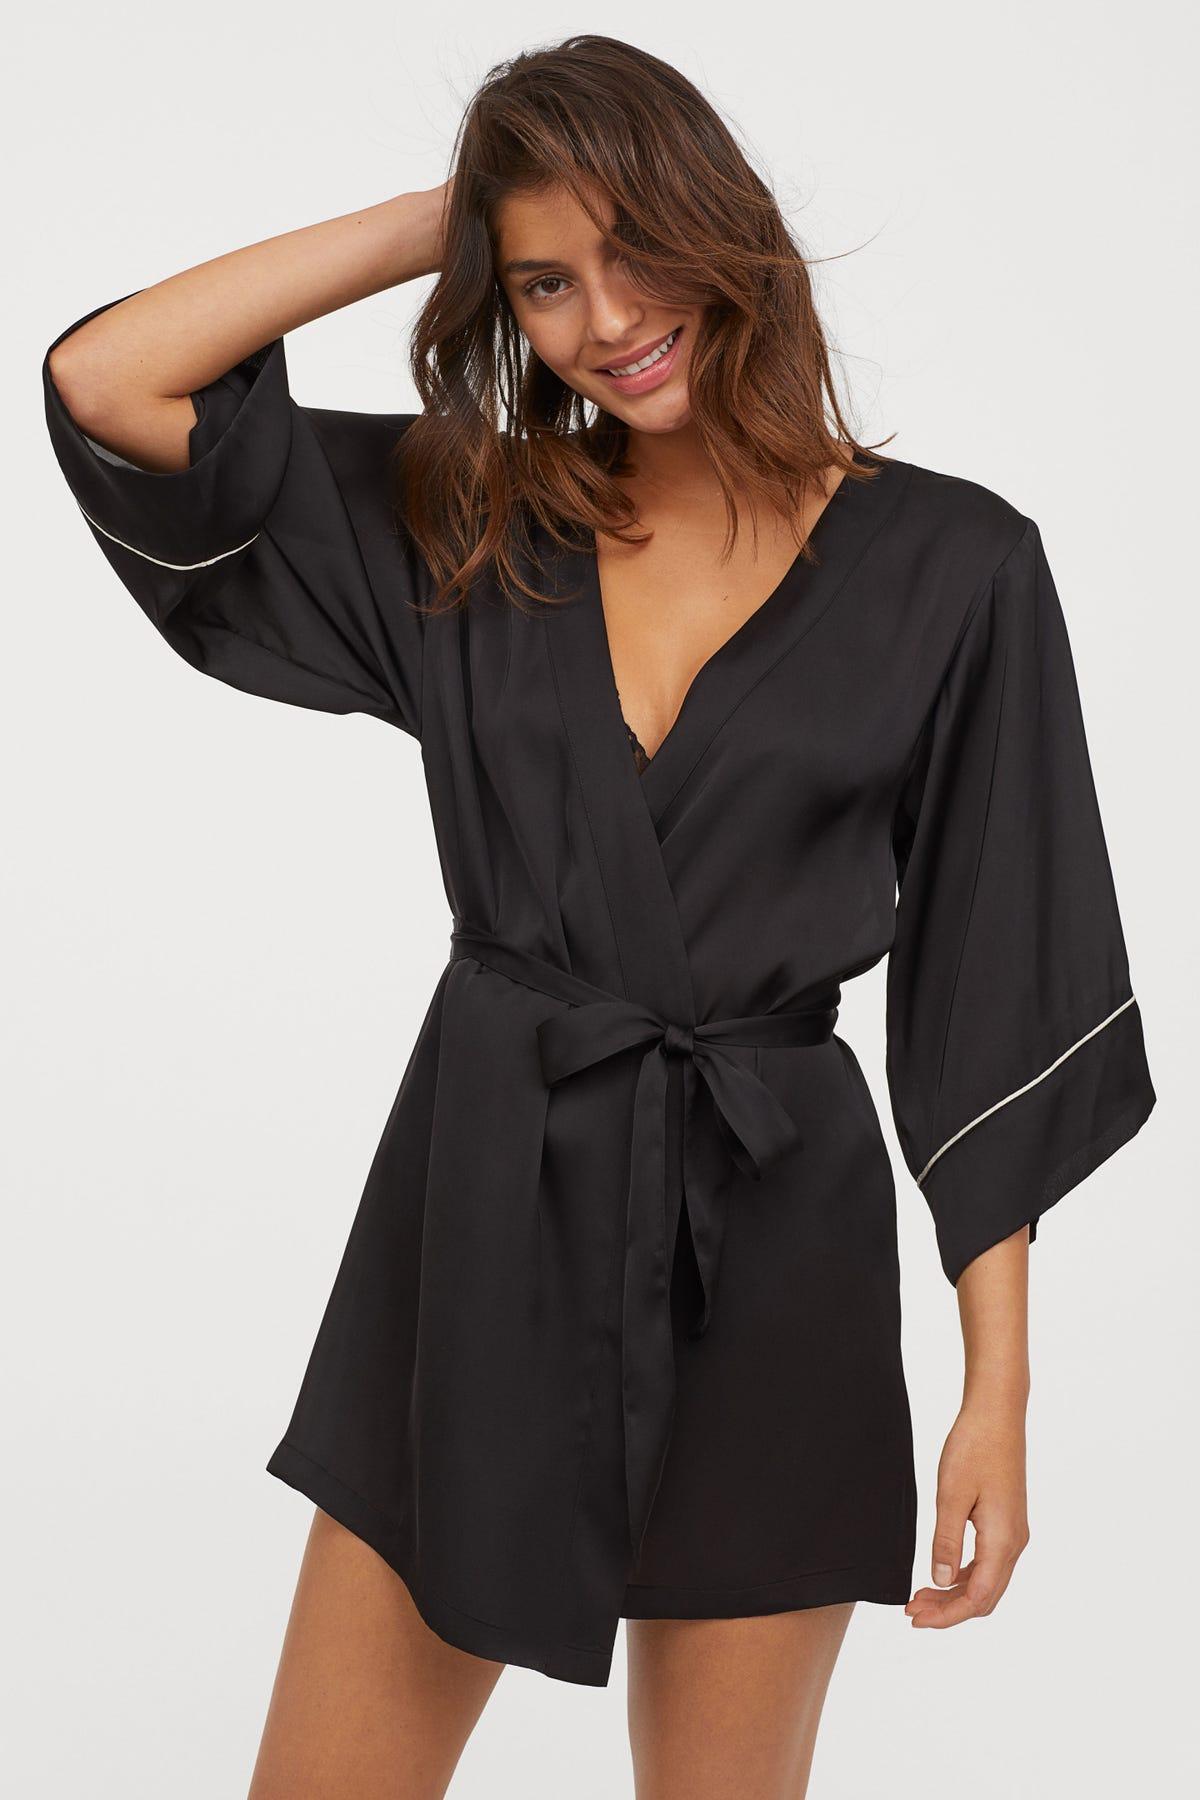 Best Womens Silk Robes, Bathrobes, Kimonos 2019